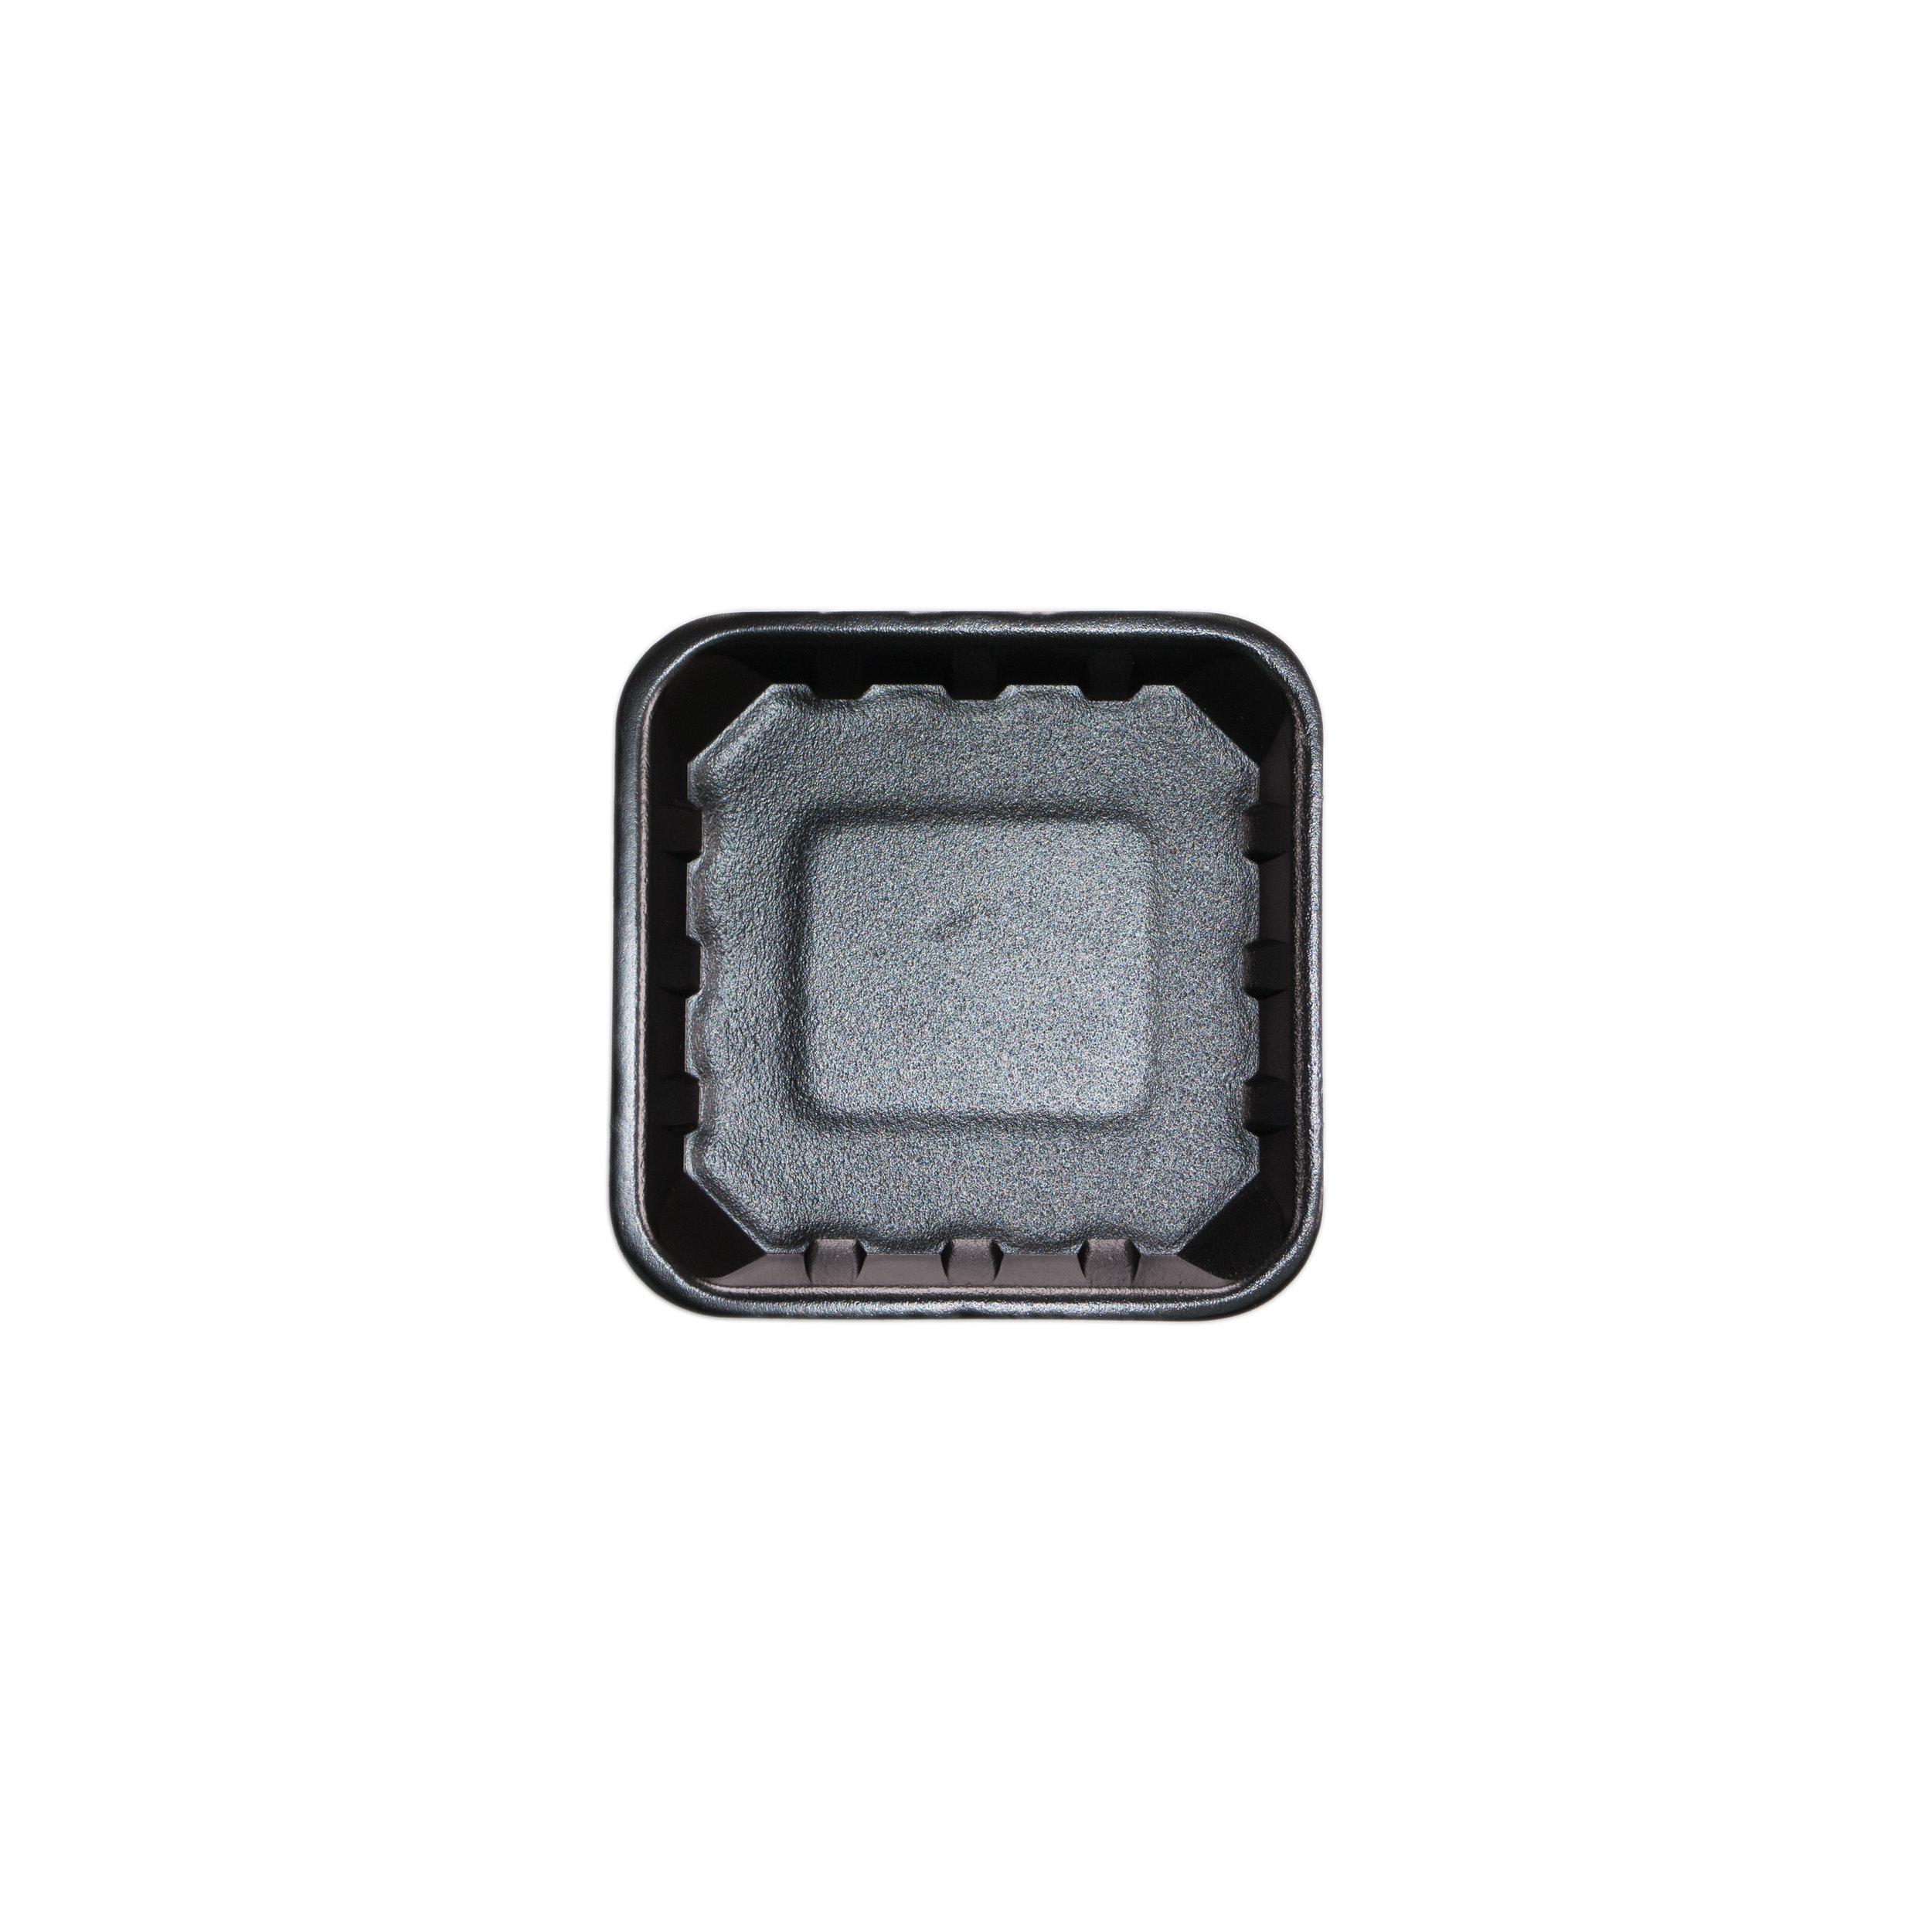 iK0301      CLOSED CELL SHALLOW 5x5    125 per sleeve 1000 per carton